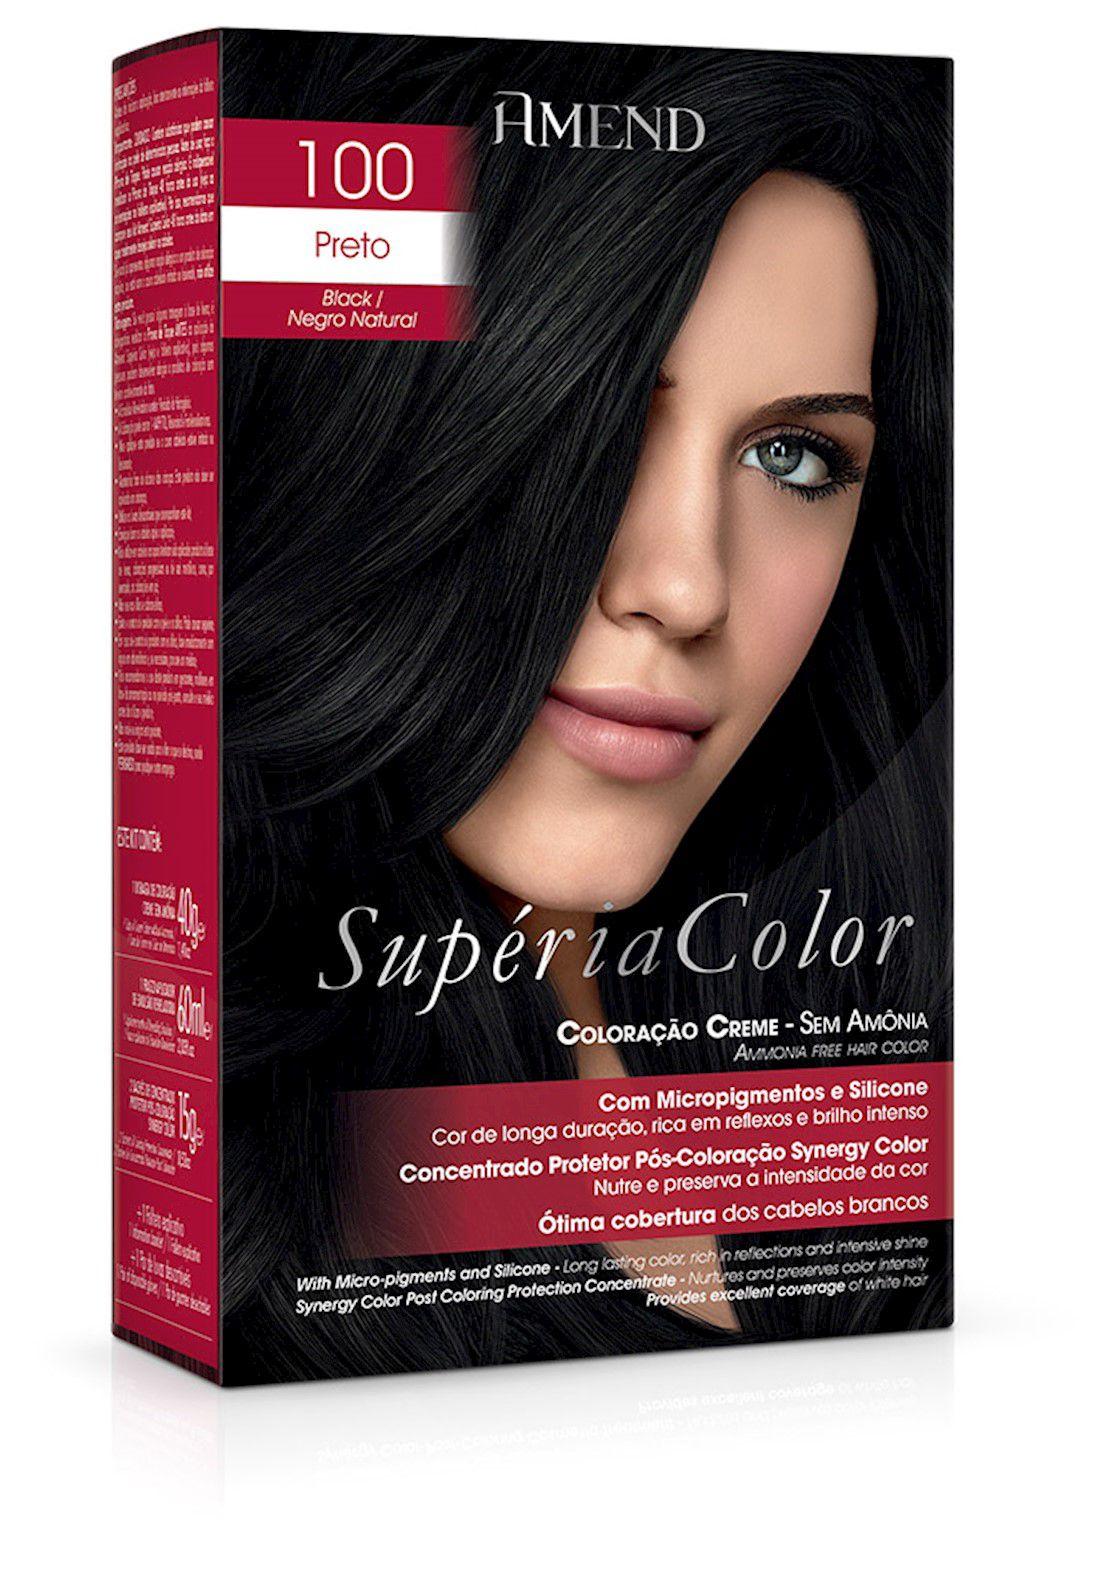 Amend Tonalizante Supéria Color 100 Preto